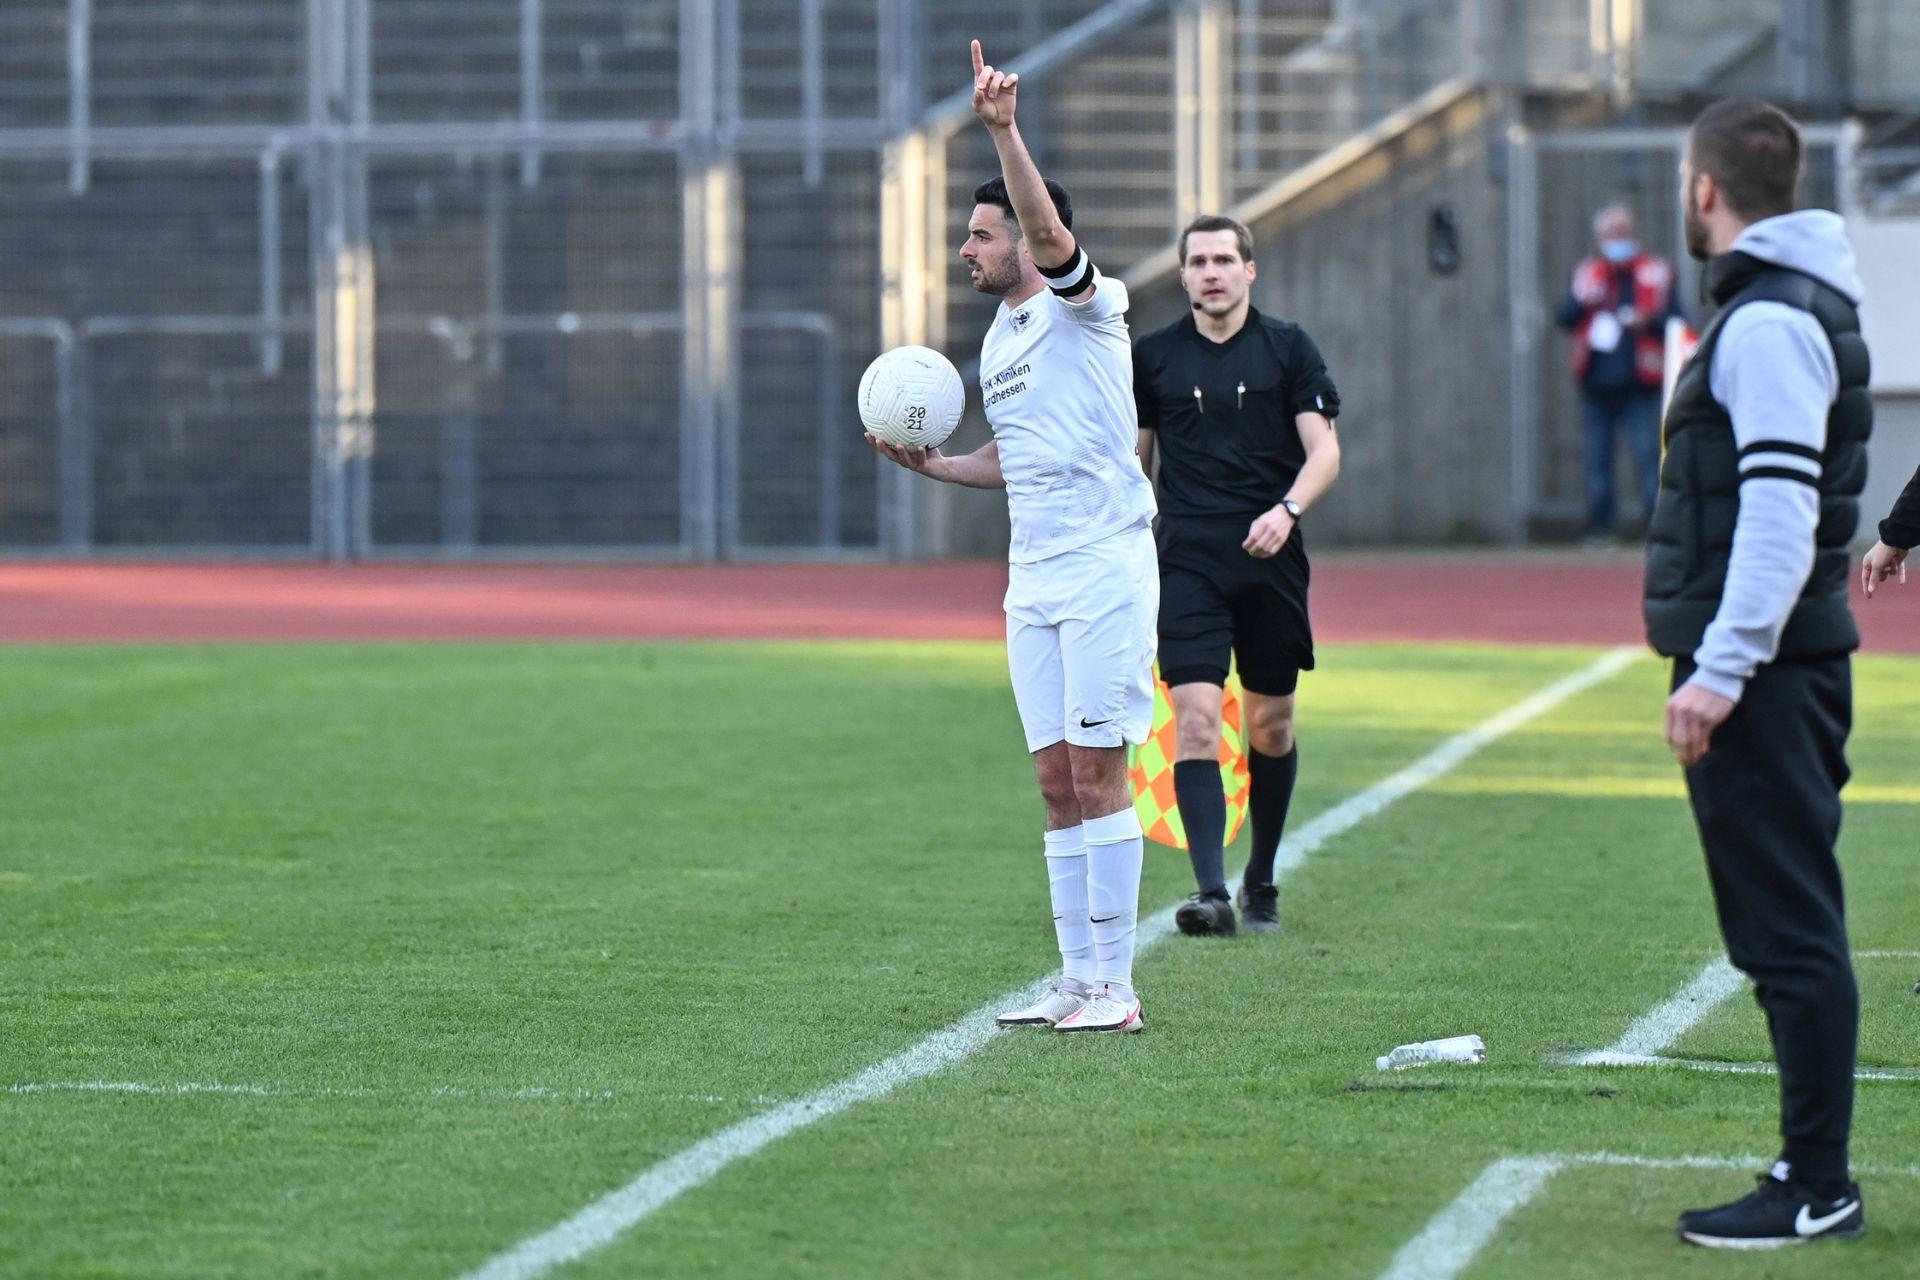 Regionalliga Südwest 2020/21, KSV Hessen Kassel, Bahlinger SC, Endstand 1:1, Adrian Bravo Sanchez, Tobias Damm